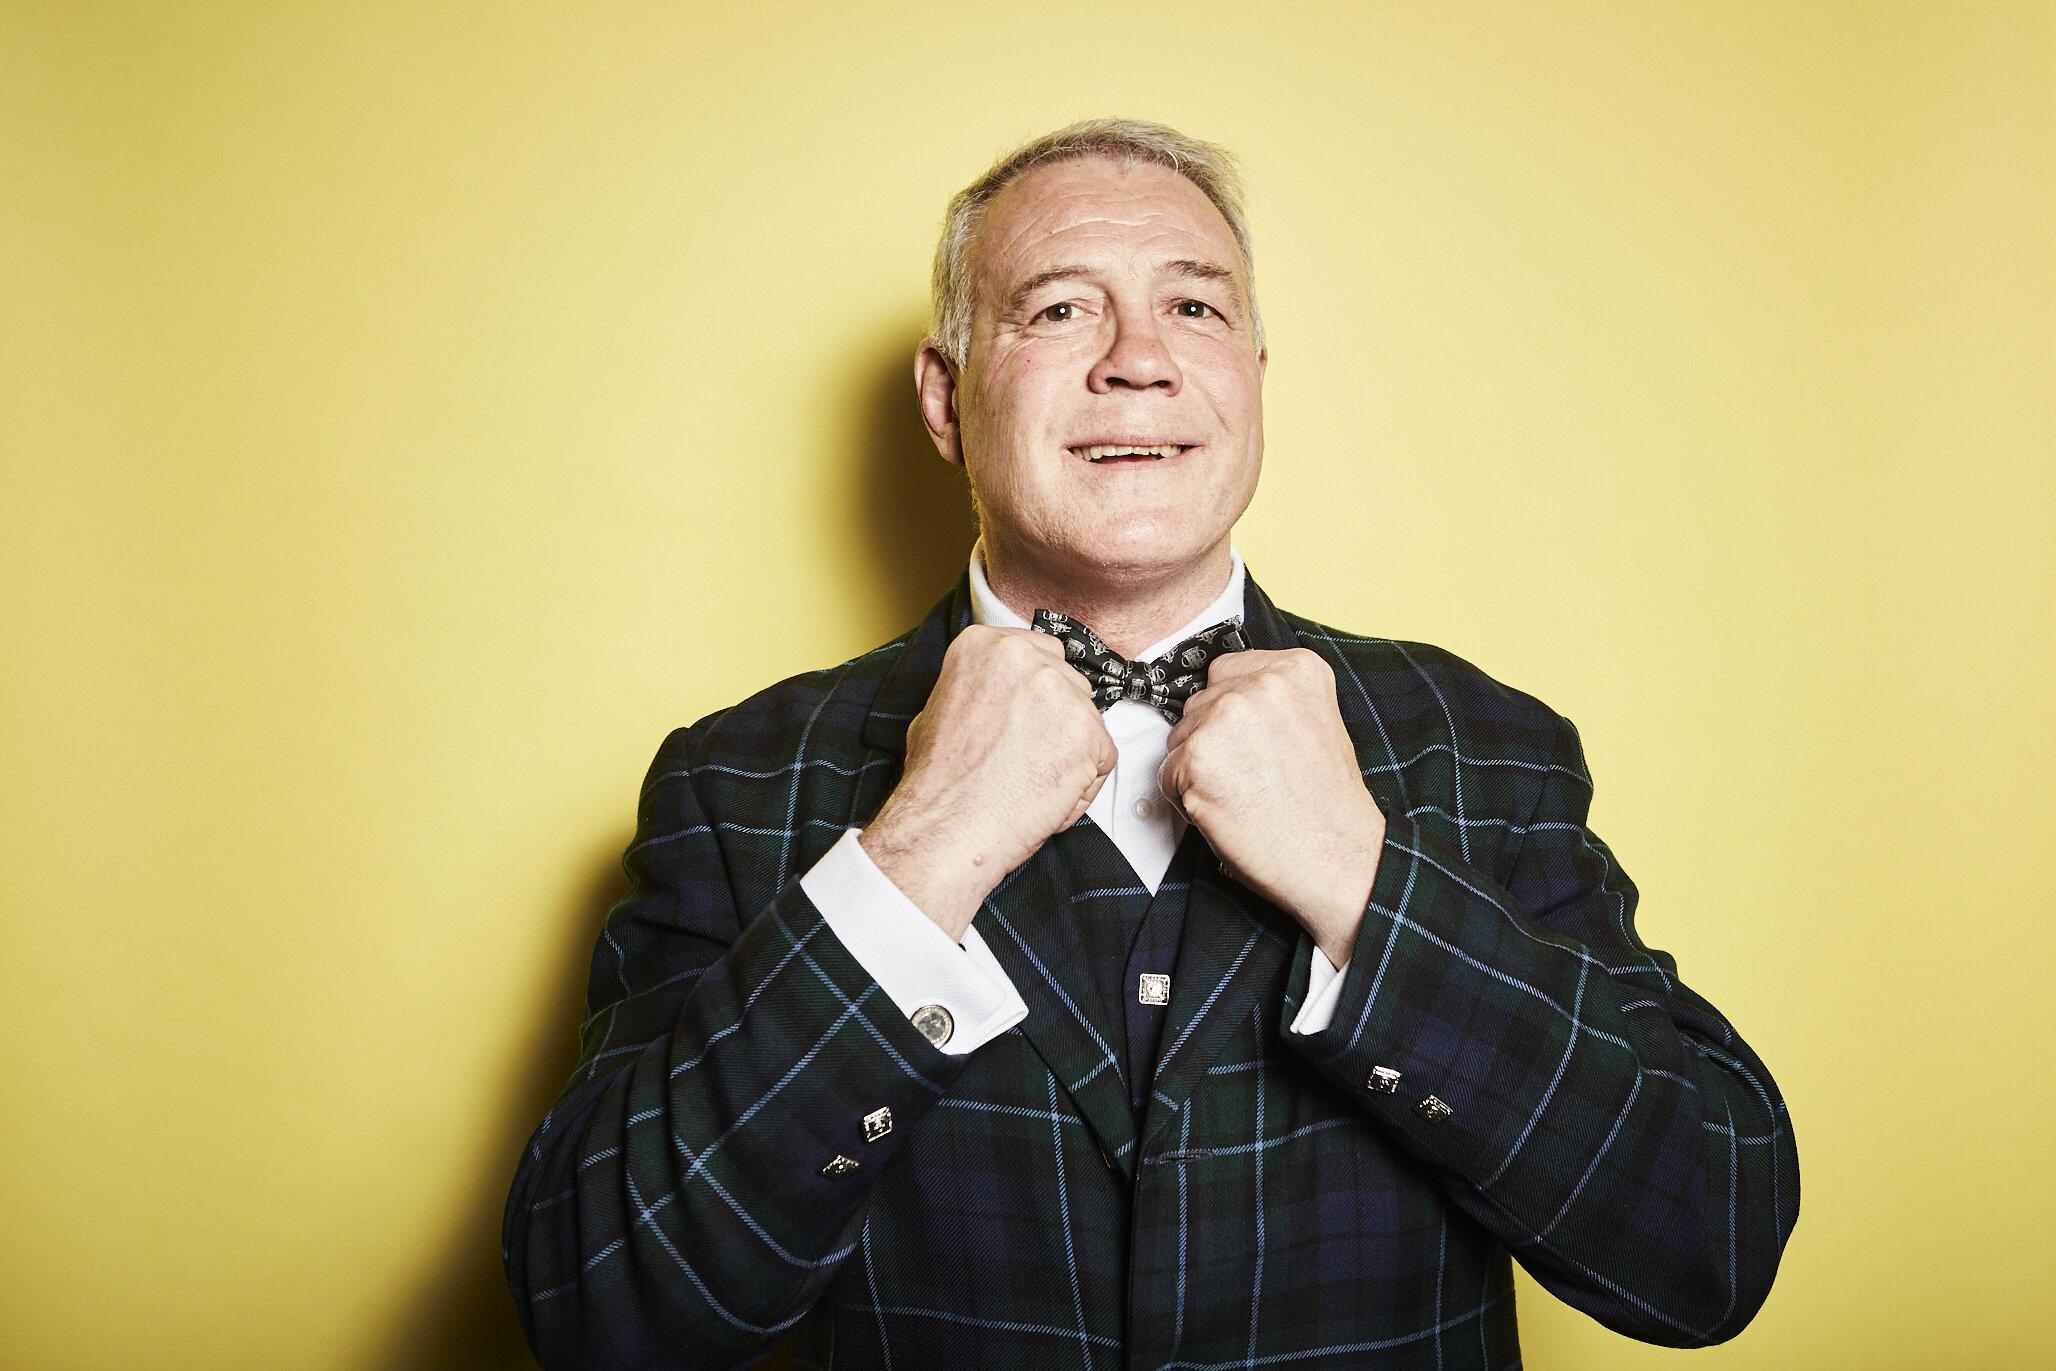 Scottish legend Scott Hastings